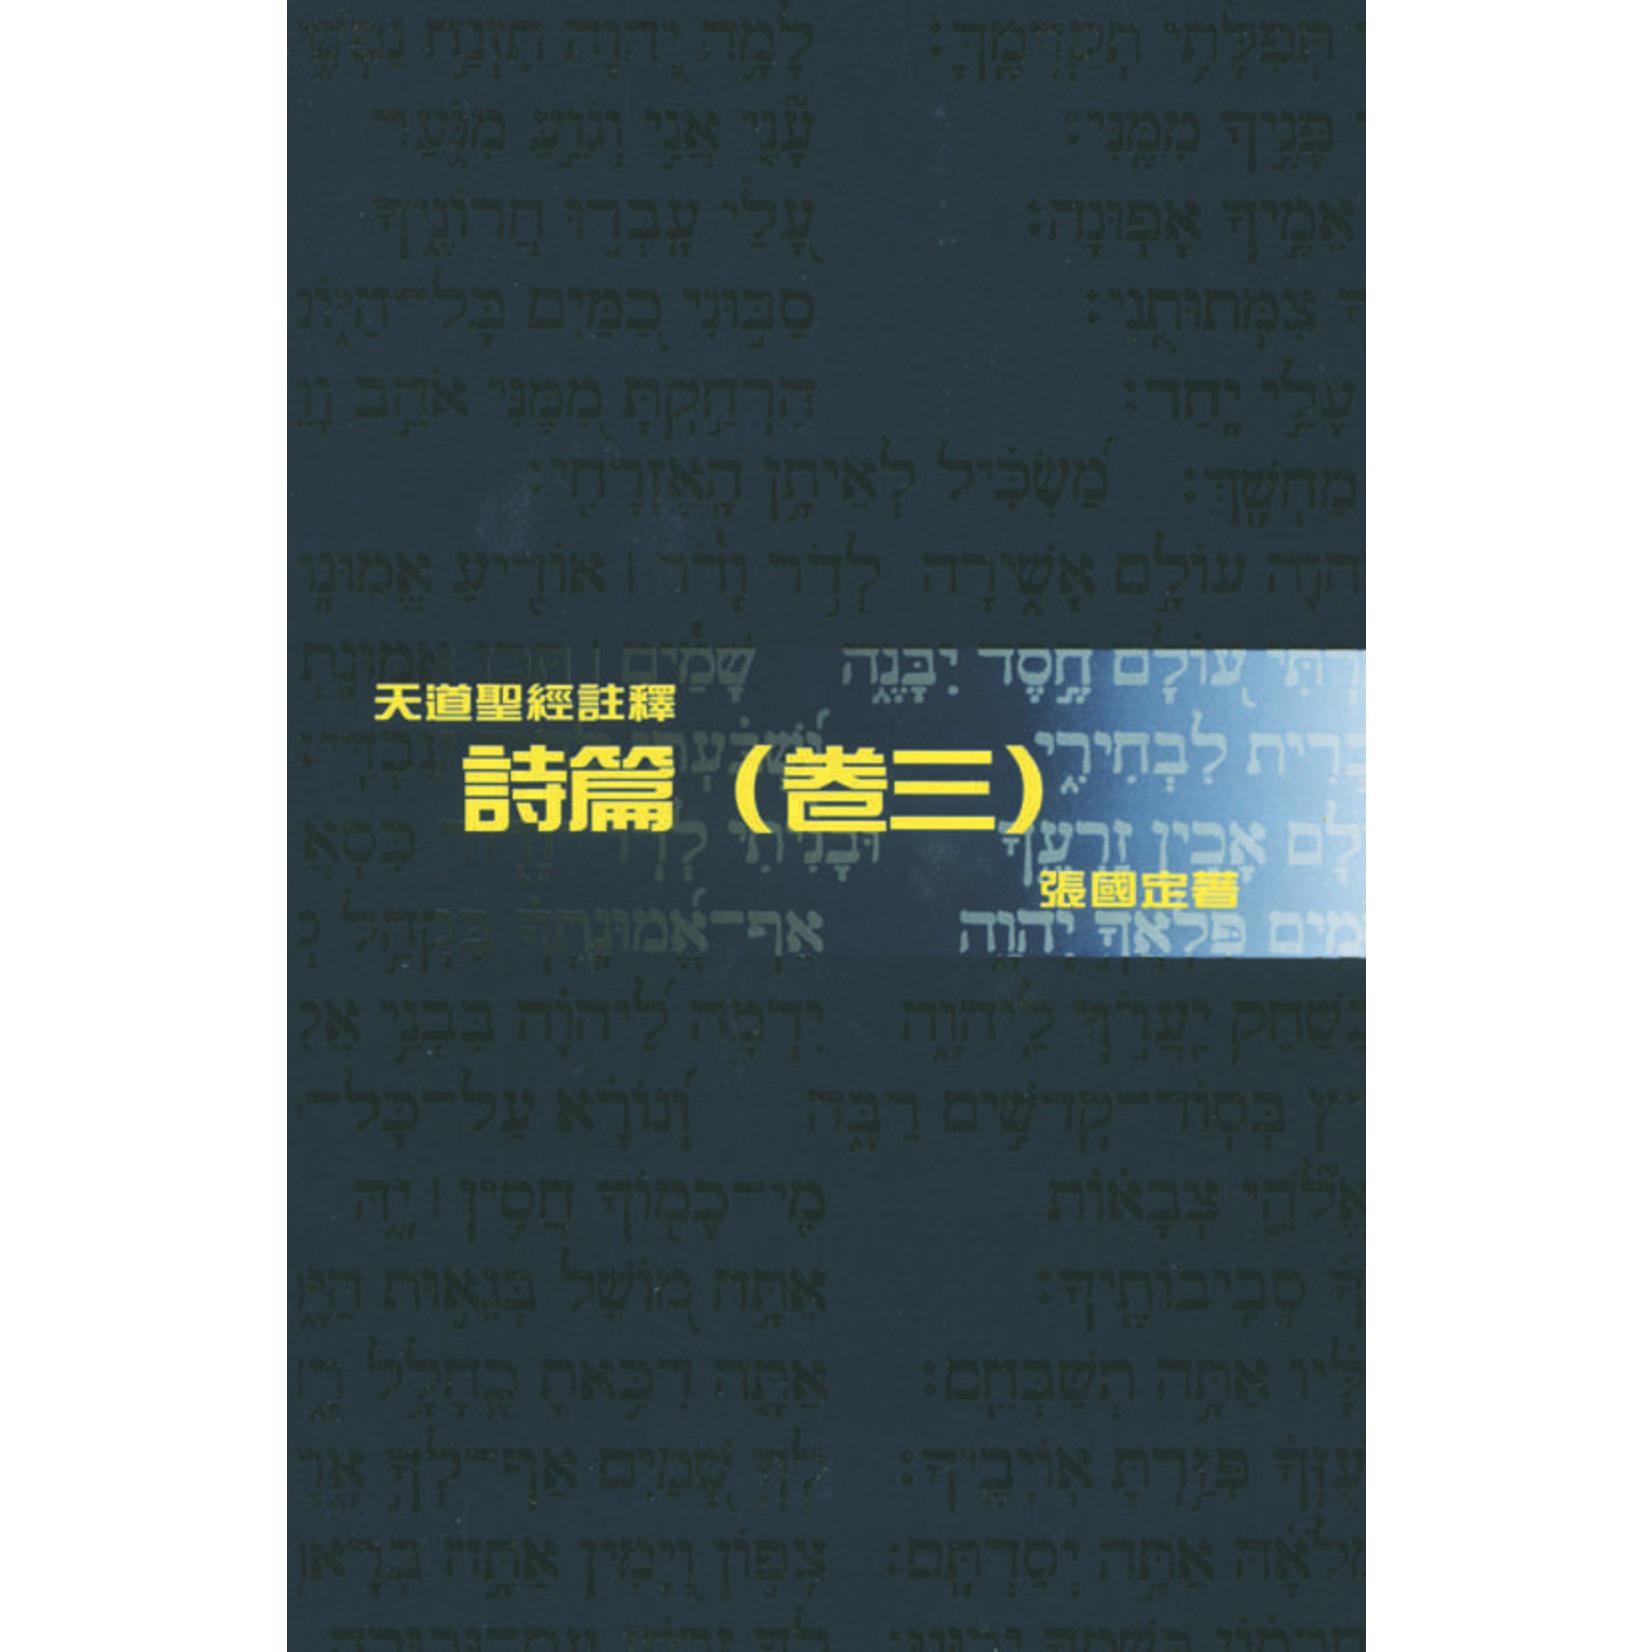 天道書樓 Tien Dao Publishing House 天道聖經註釋:詩篇(卷三)